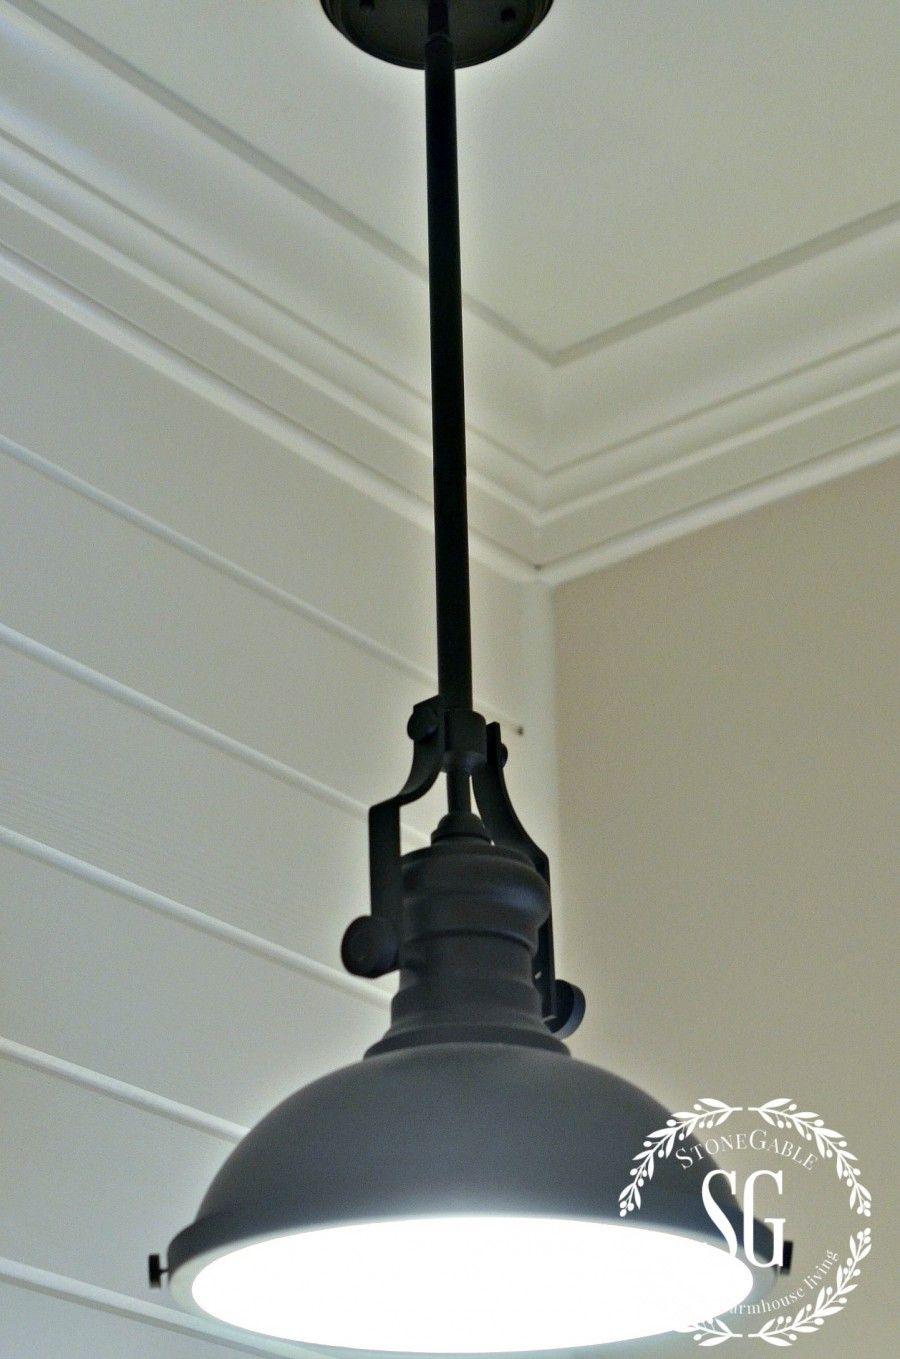 FARMHOUSE POWDER ROOM REVEAL | Pinterest | Powder room, Industrial ...